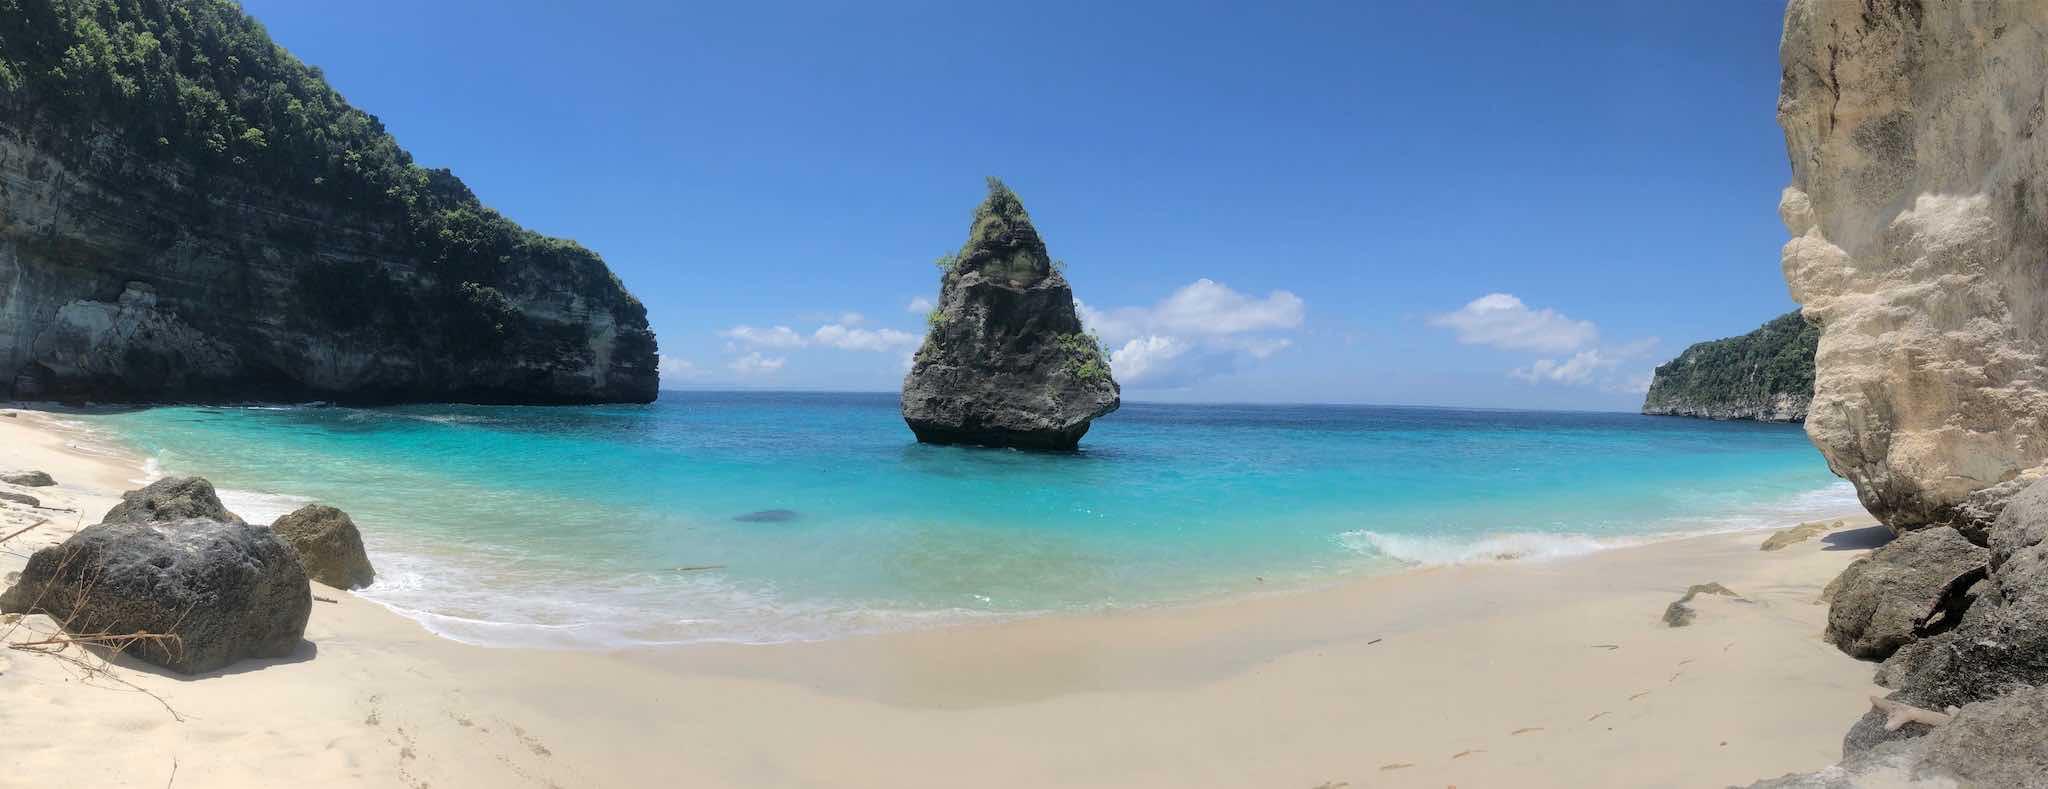 Suwehan Beach Nusa Penida Bali panorama